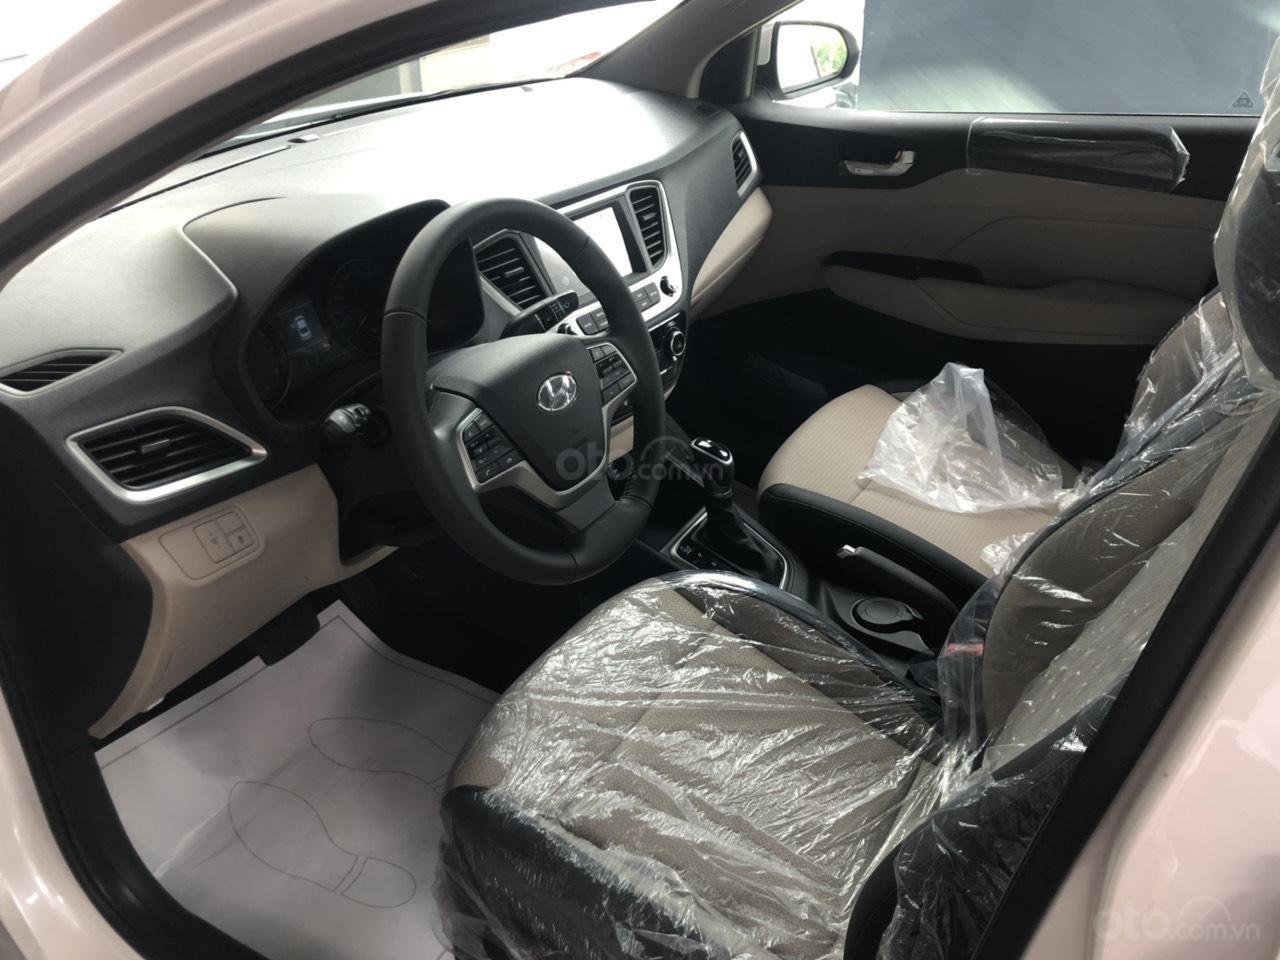 Bán Hyundai Accent 2019 - Giá tốt - xe sẵn - Bank bao đậu (8)